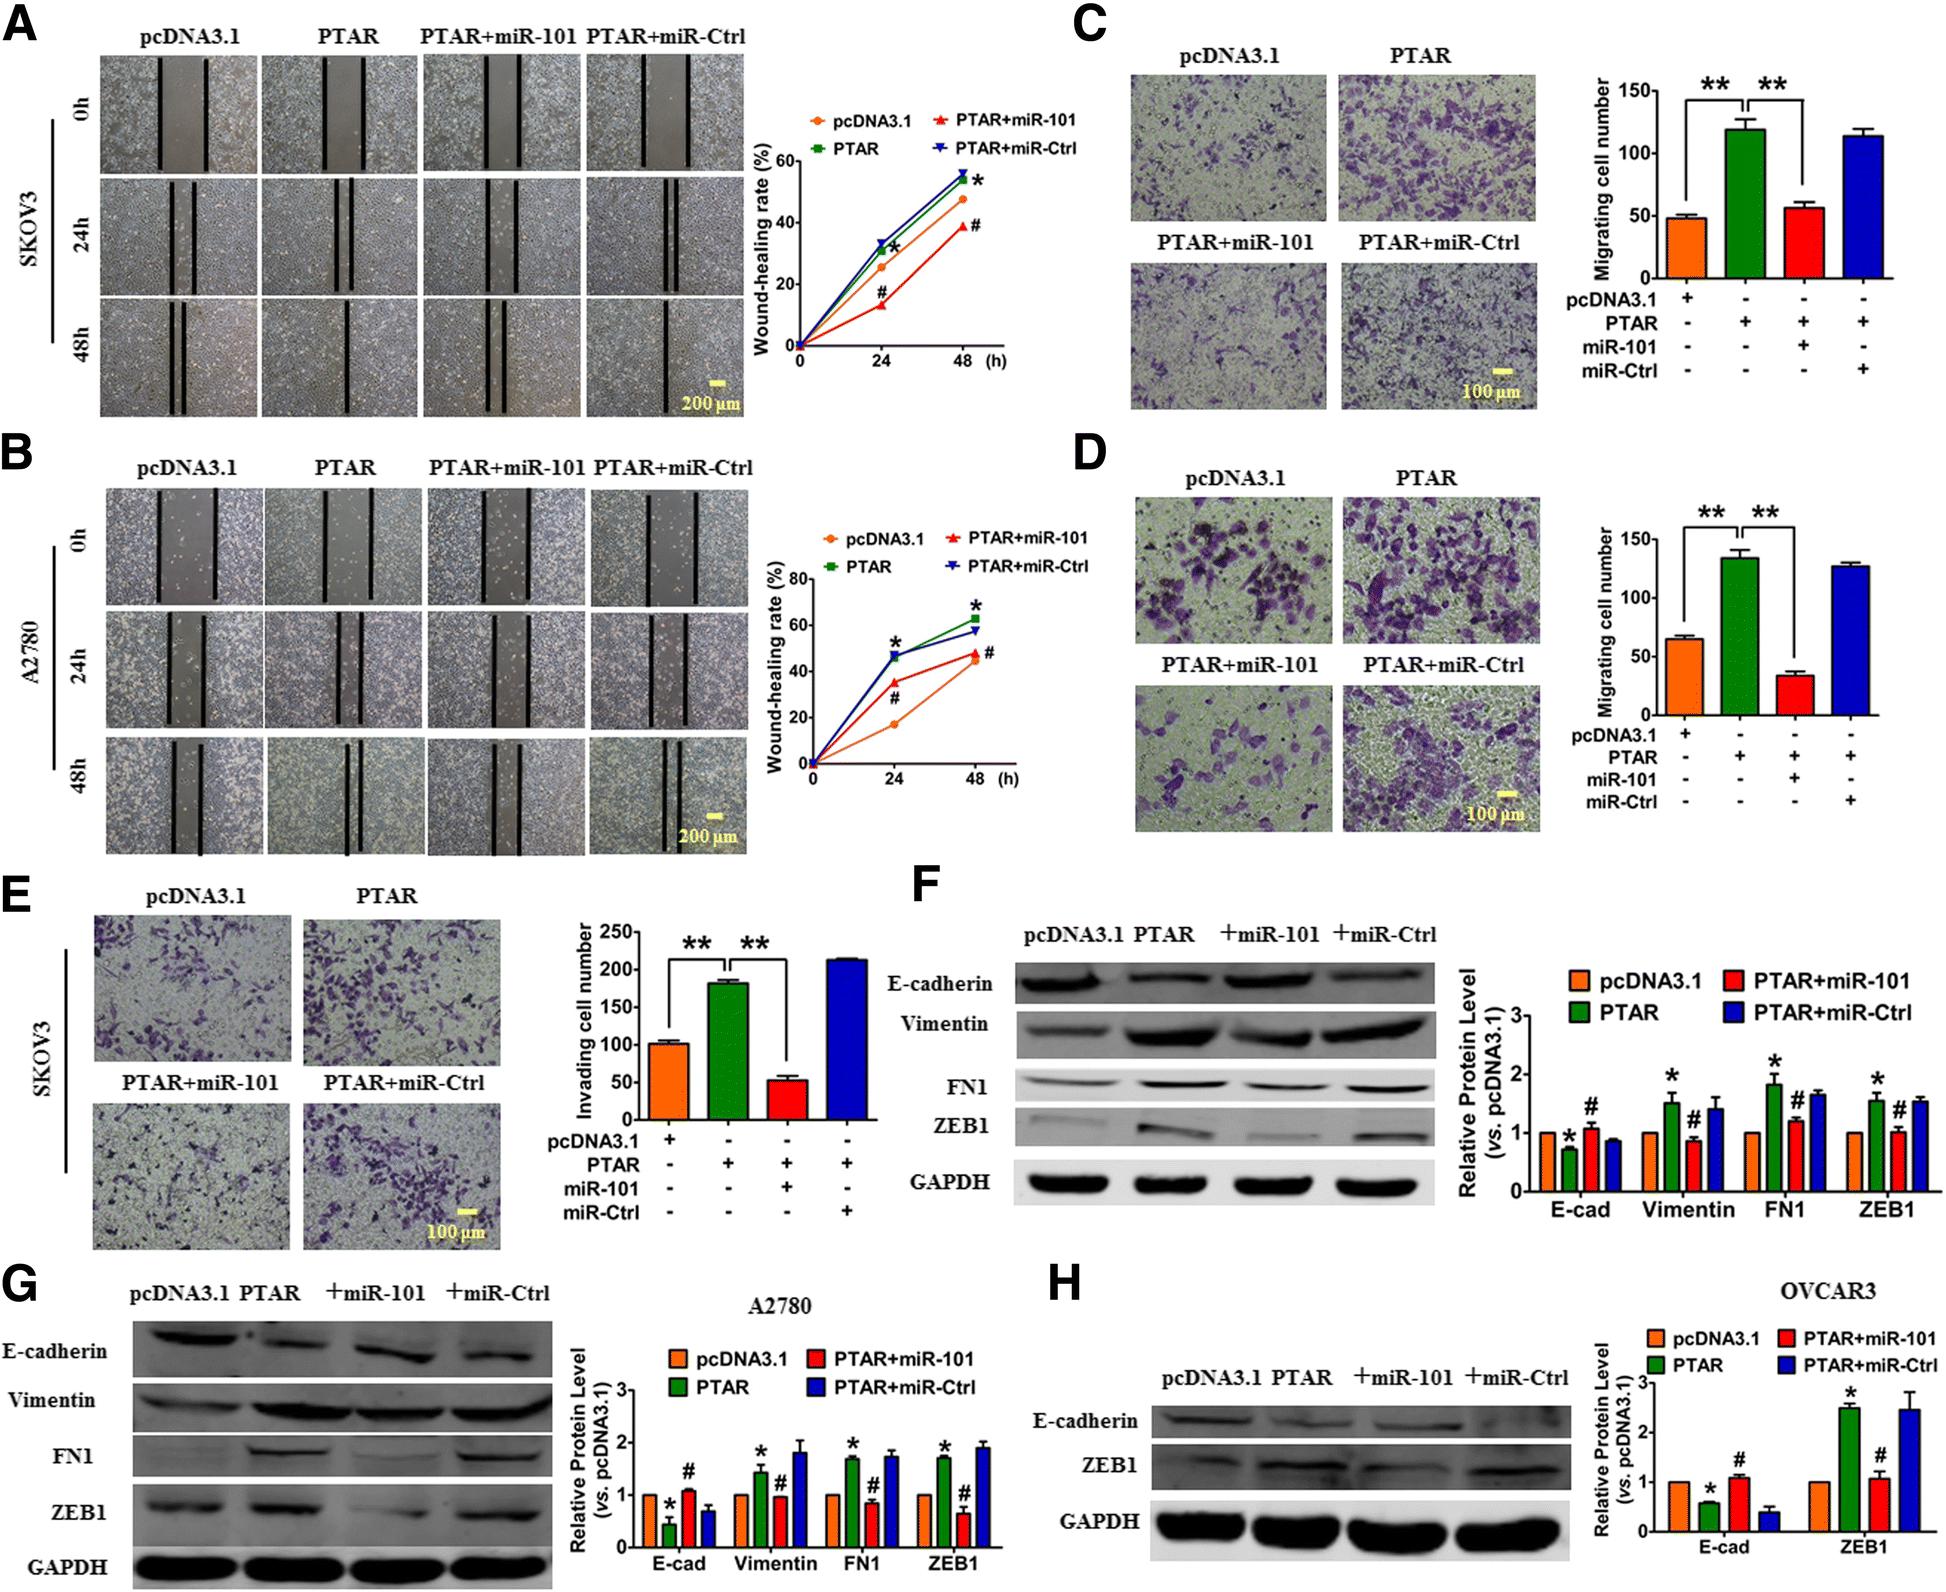 Ana Walczak Nude lncrna ptar promotes emt and invasion-metastasis in serous